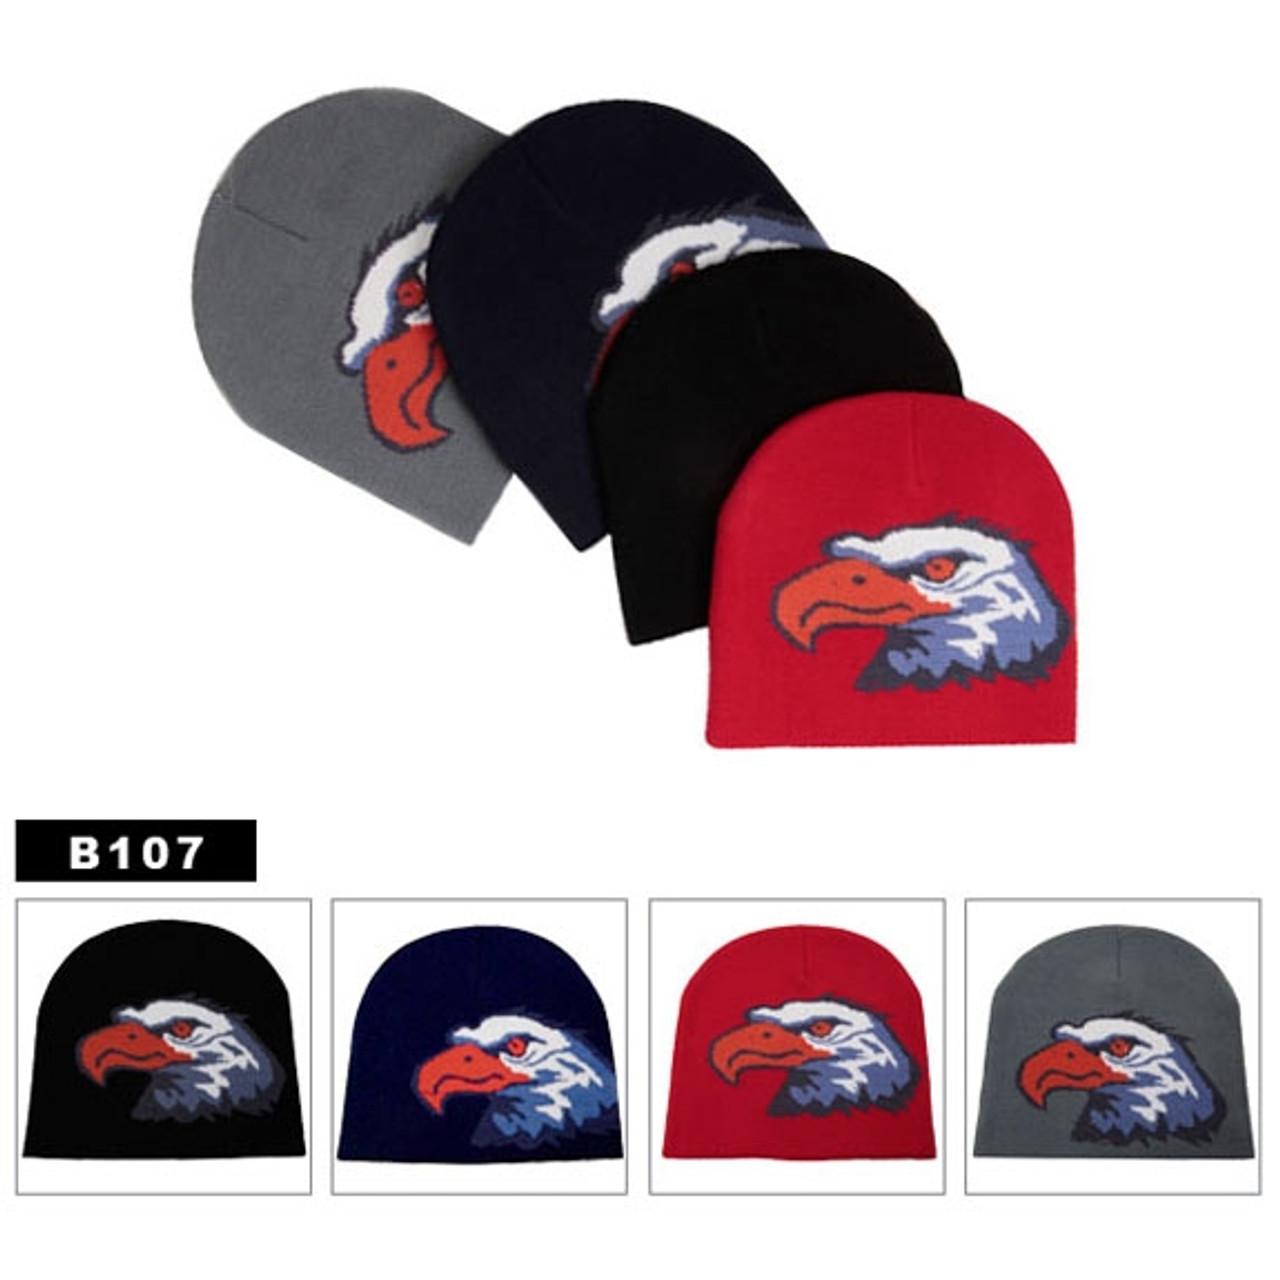 Nice looking Caps